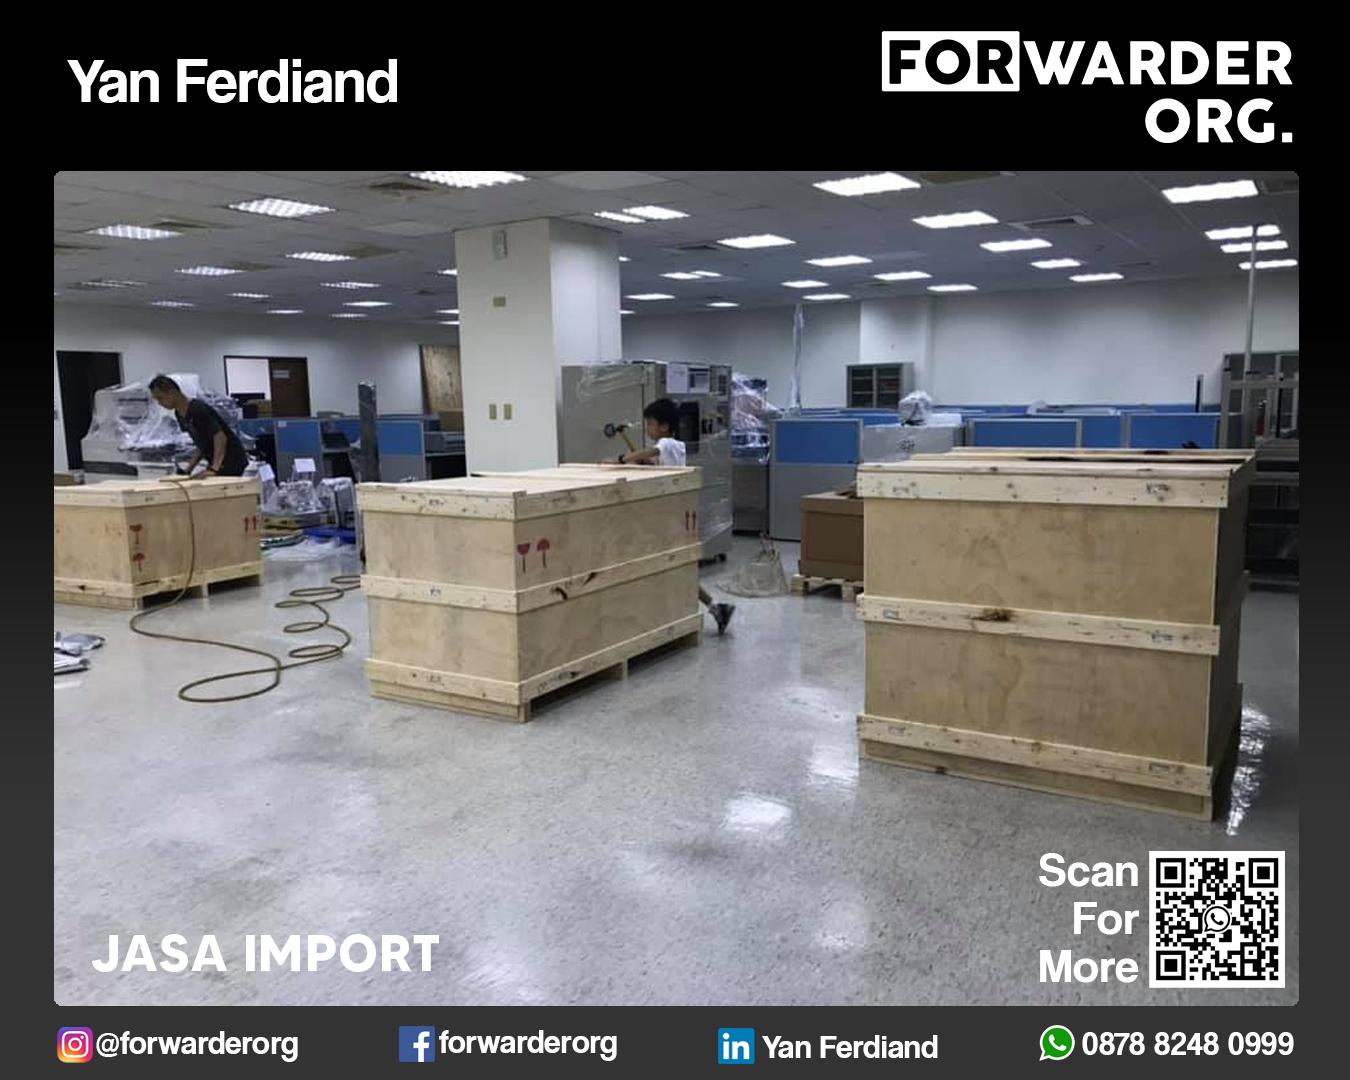 Jasa Import Mesin Baru dan Bekas dari Jepang | FORWARDER ORG